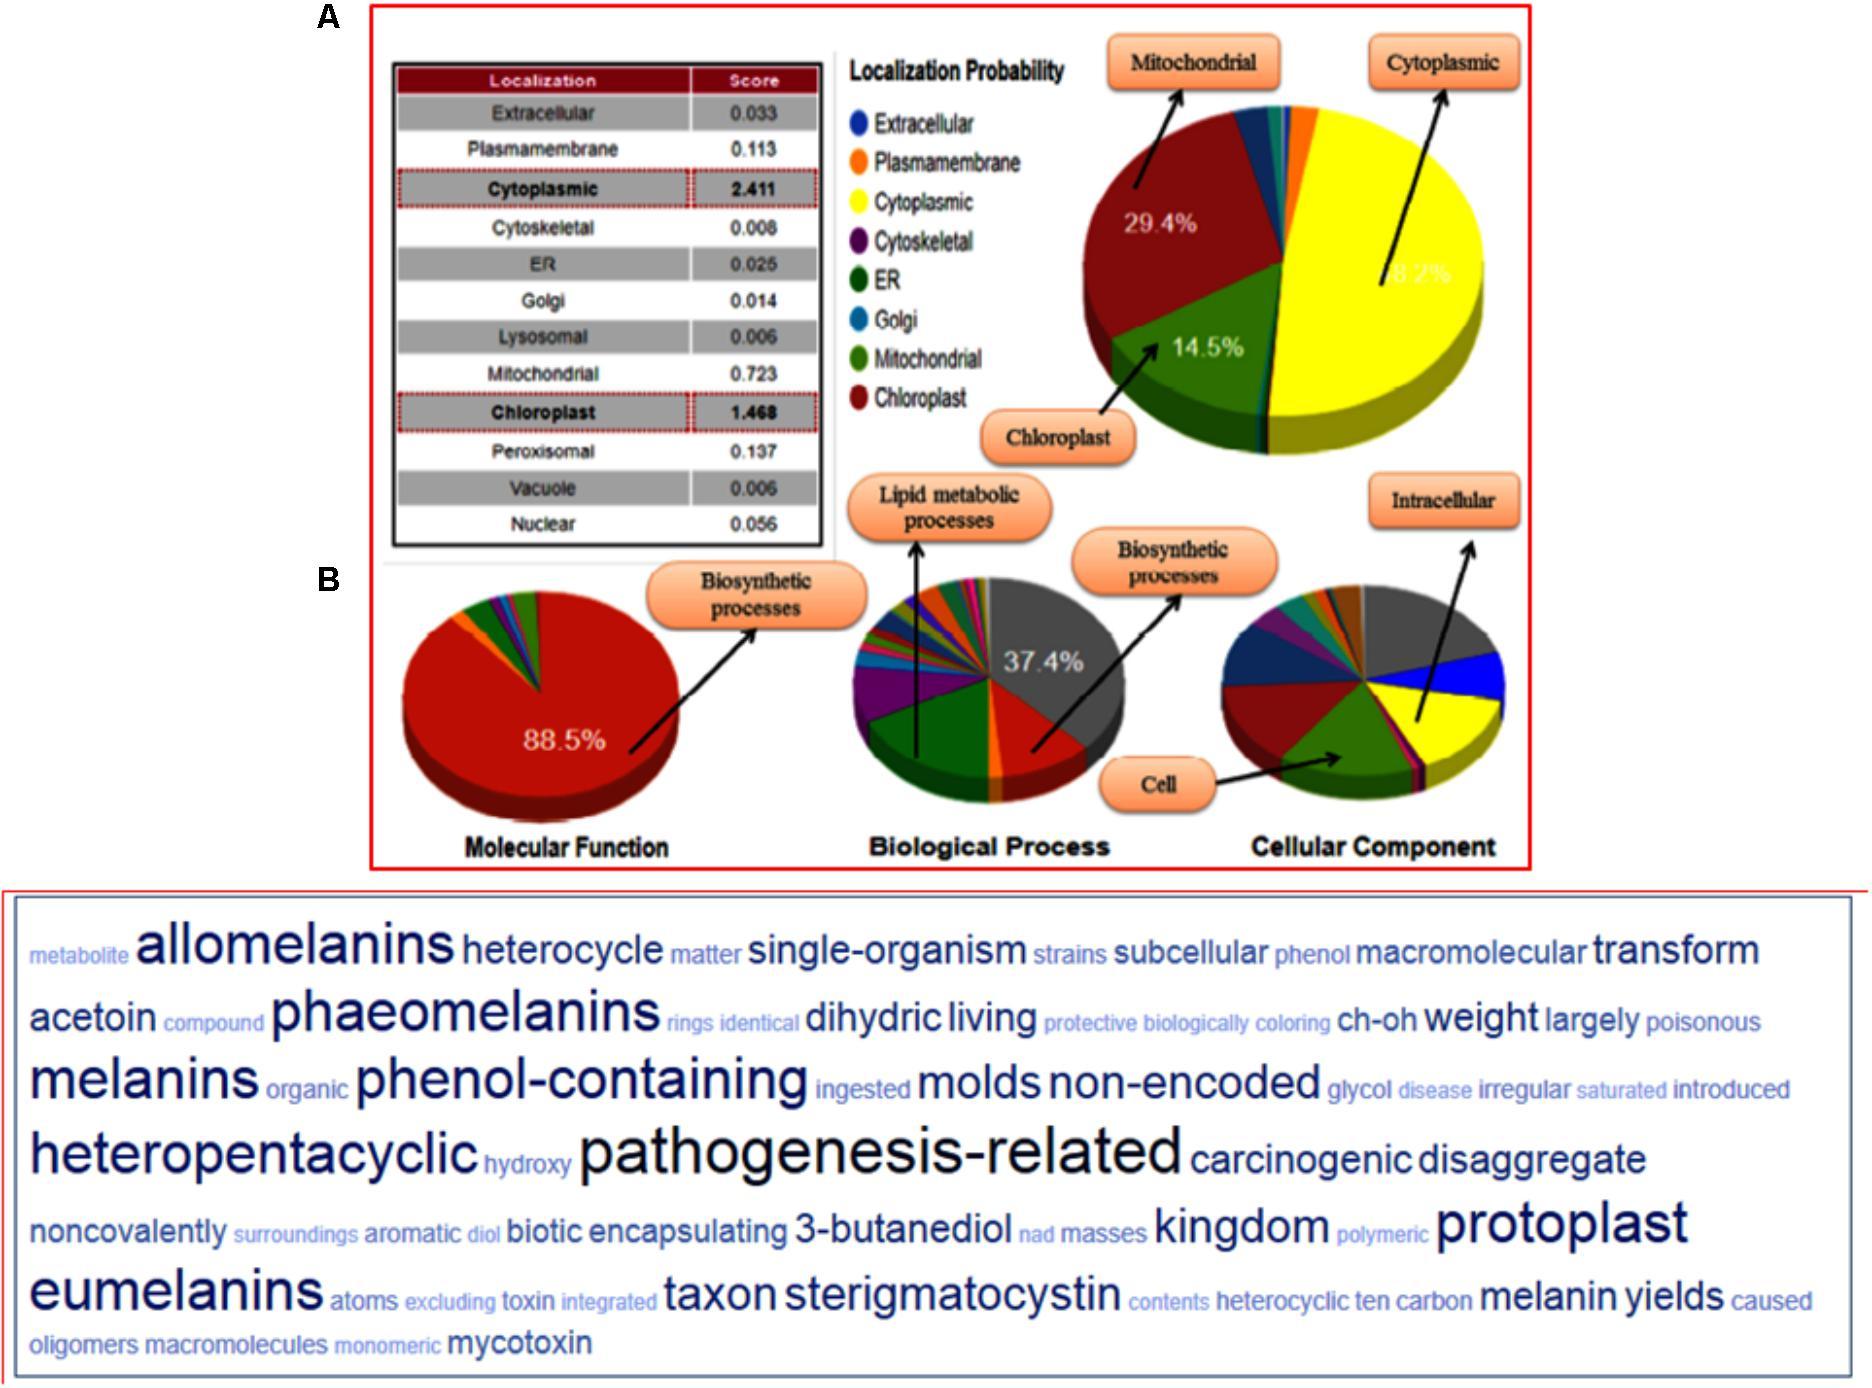 Frontiers   In silico Prediction, Characterization, Molecular